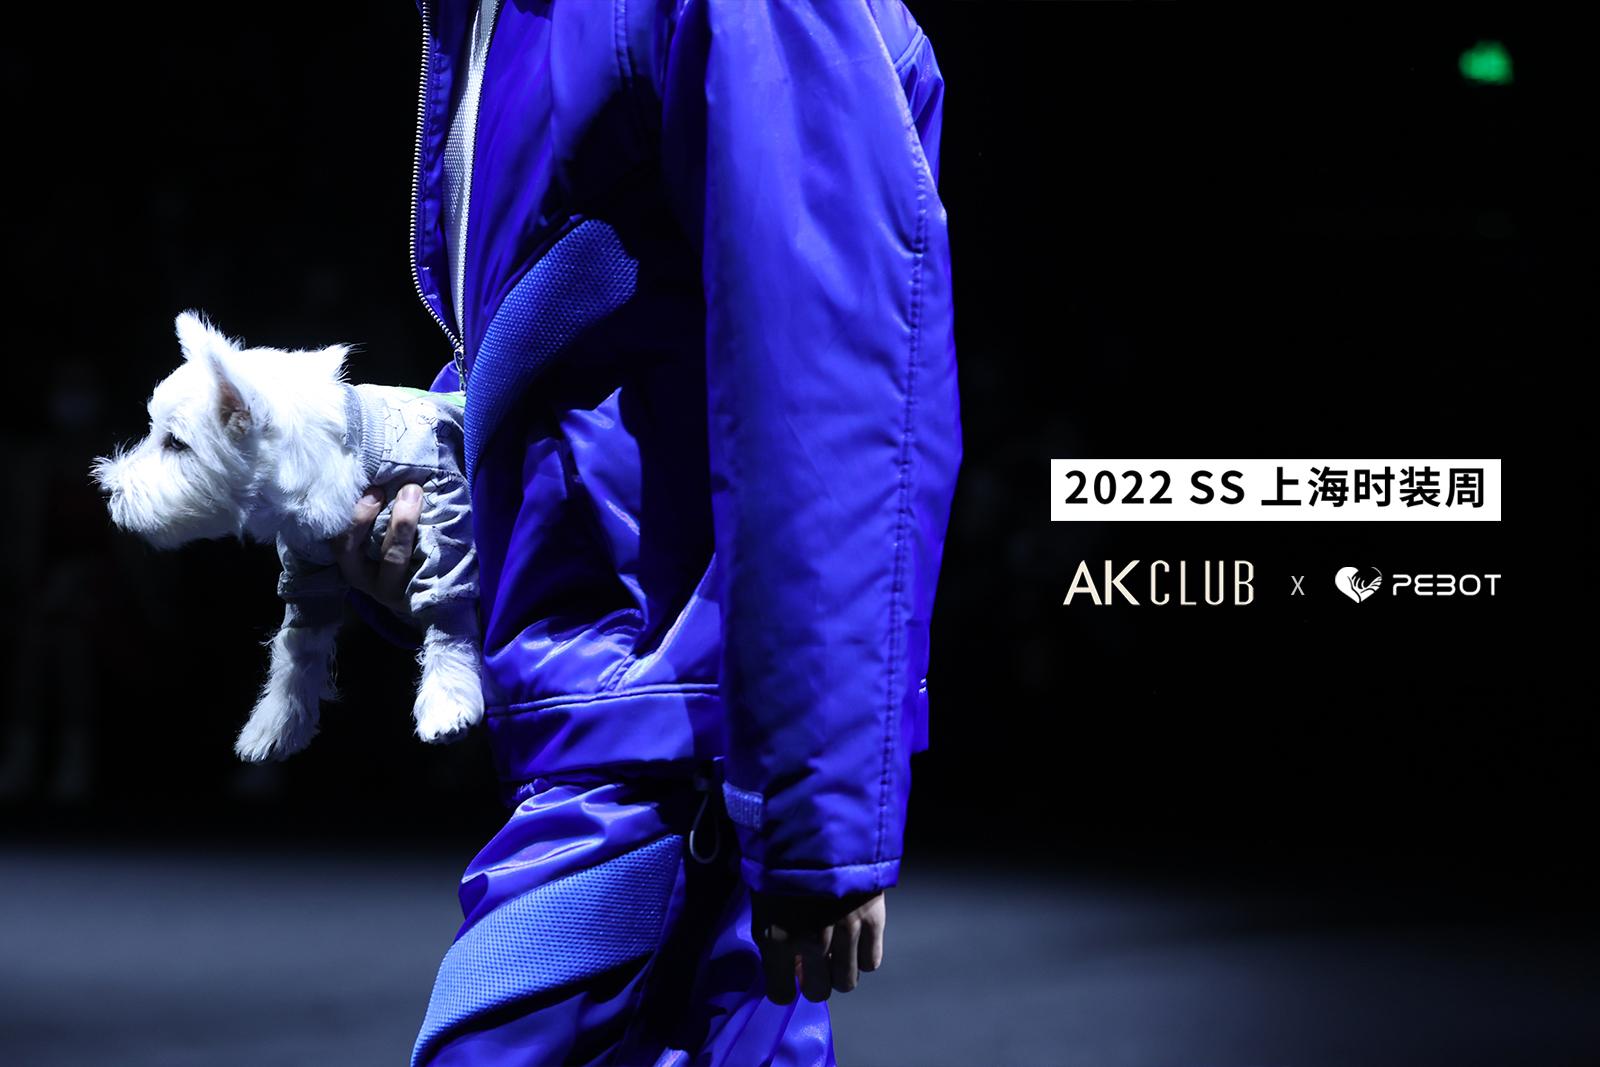 PEBOT宠物衣服大受欢迎,耗资百万自主研发彩色反光面料